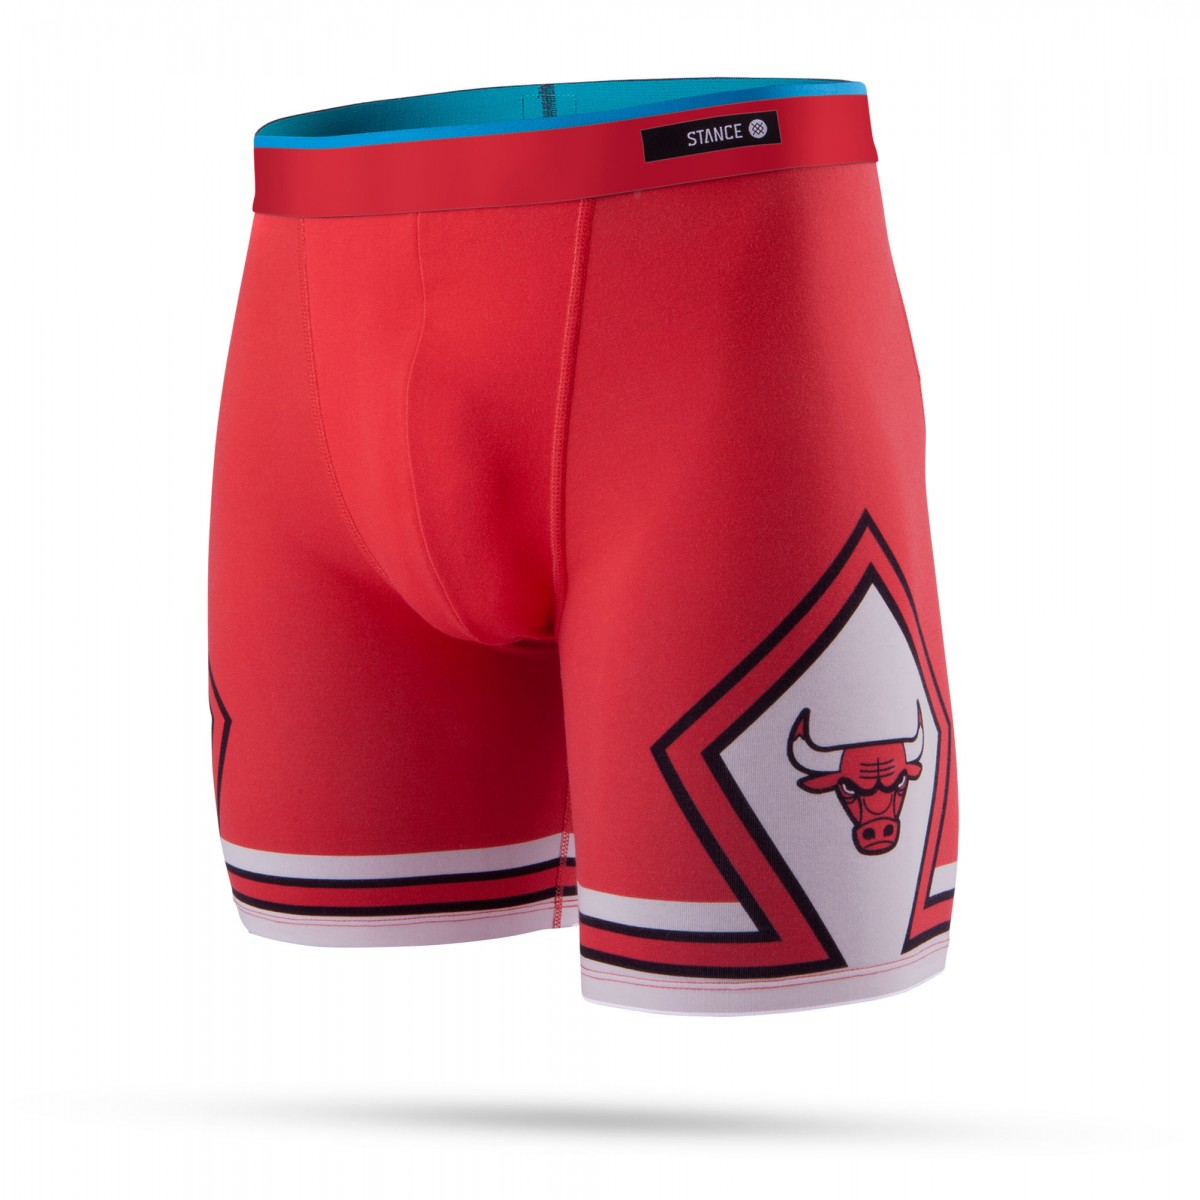 Stance Mens Underwear Fitted Boxer Brief 'Bulls'